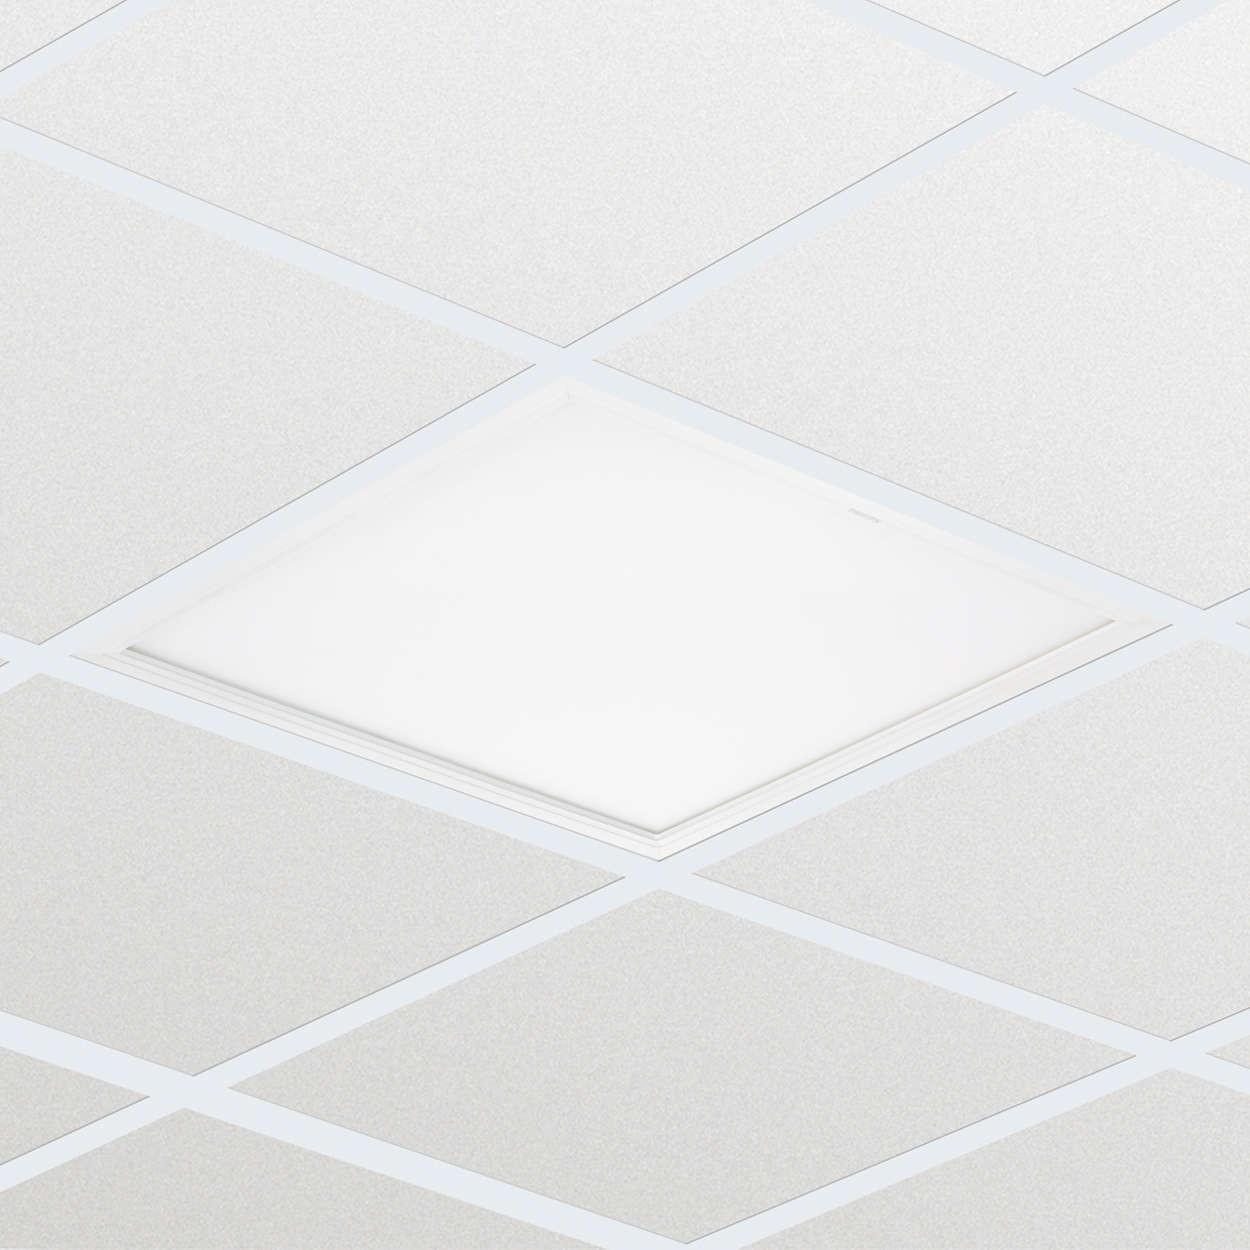 Philips RC060B LED32S/840 PSU W60L60